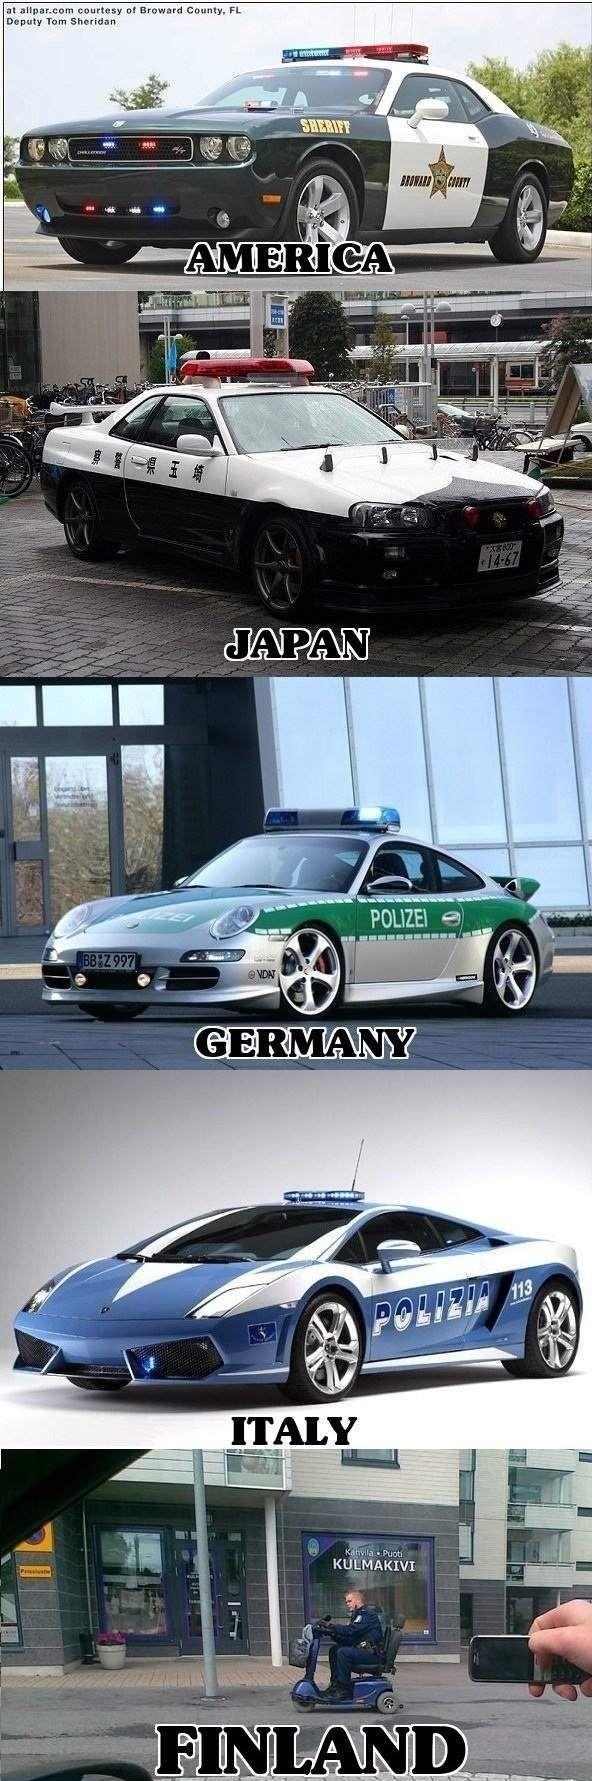 Police car !!!